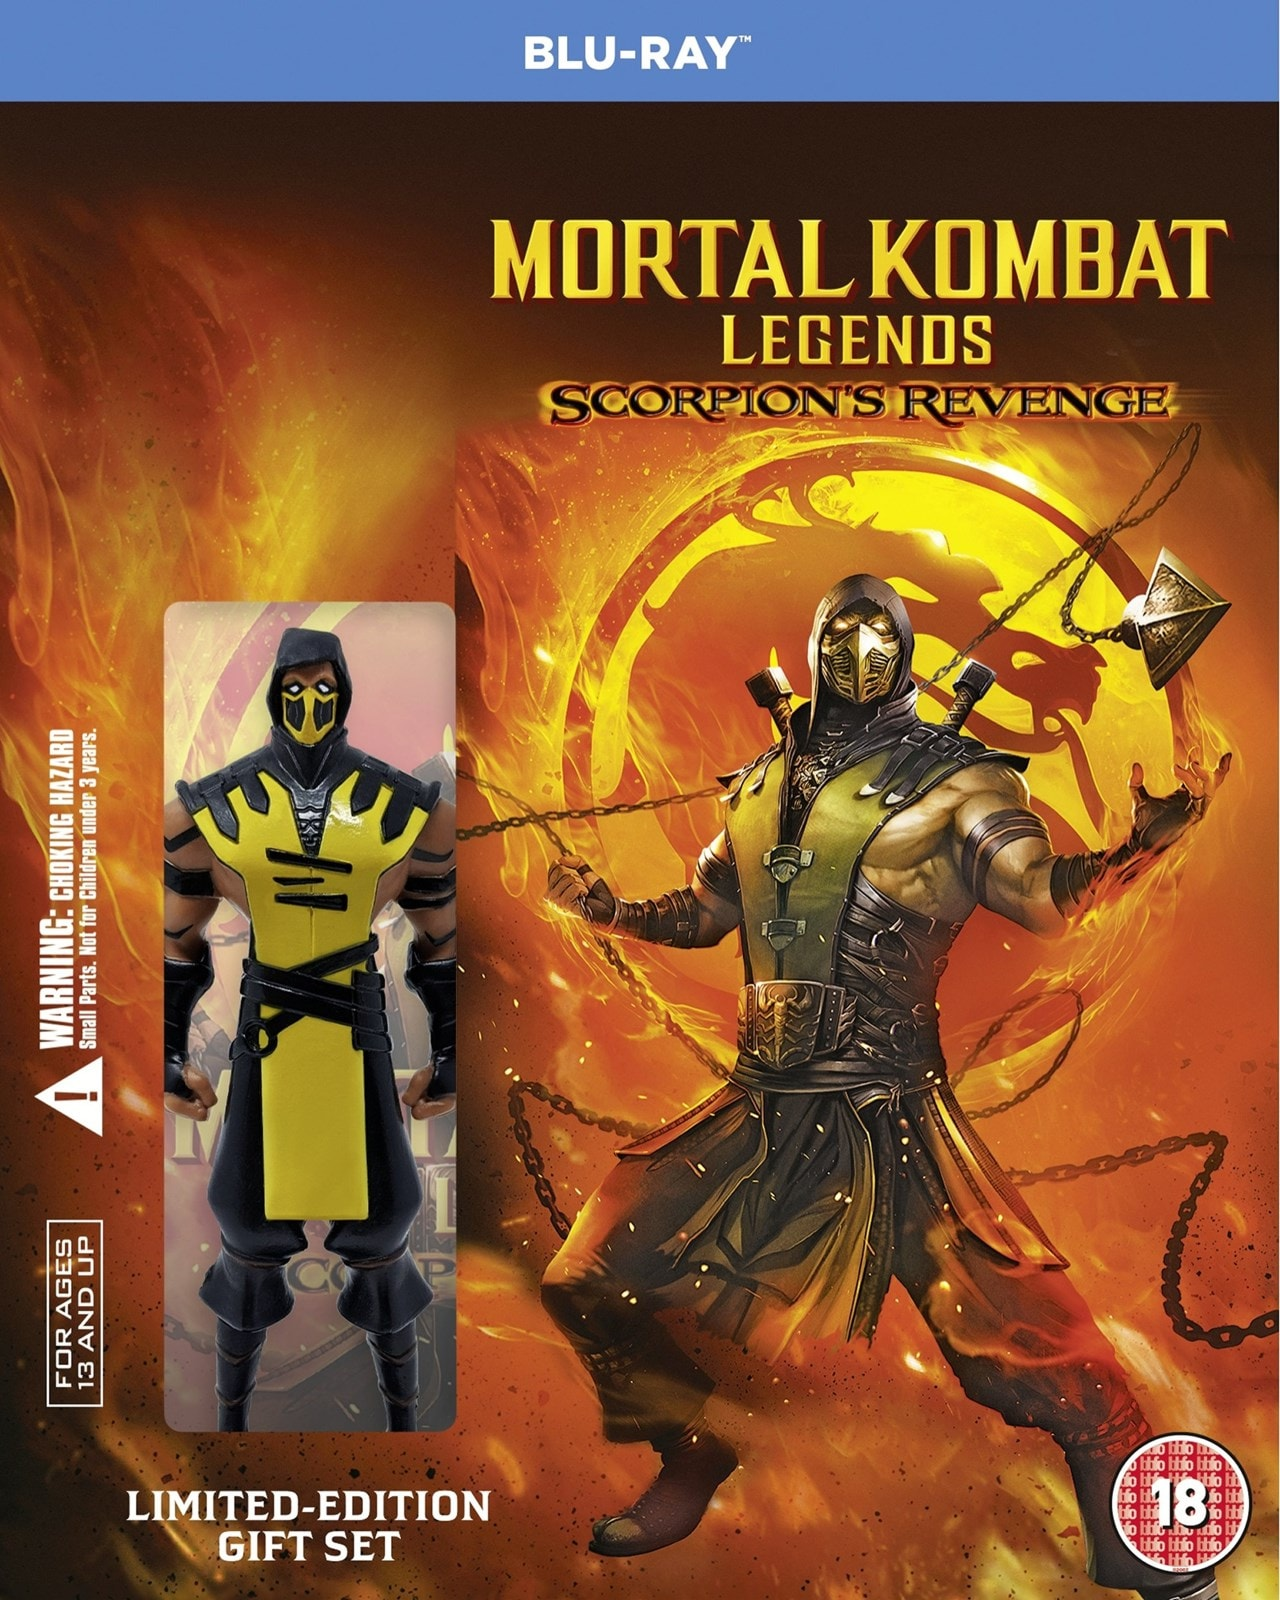 Mortal Kombat Legends Scorpion S Revenge Limited Edition Minifig Blu Ray Free Shipping Over 20 Hmv Store